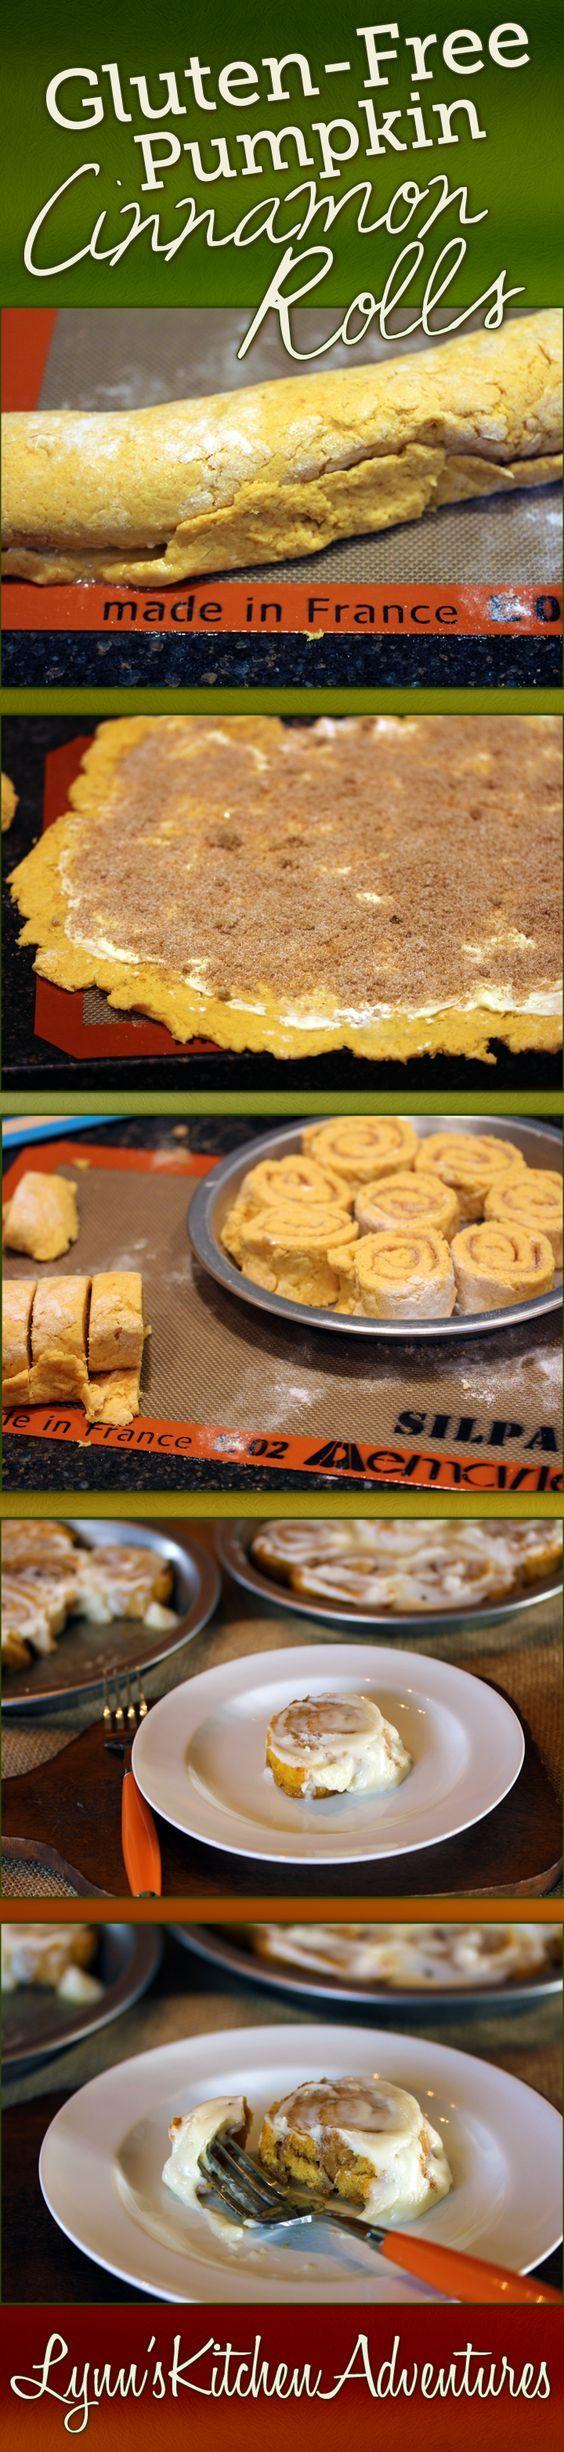 Gluten Free Pumpkin Cinnamon Rolls- Yes you can make gluten free cinnamon rolls at home that taste great!